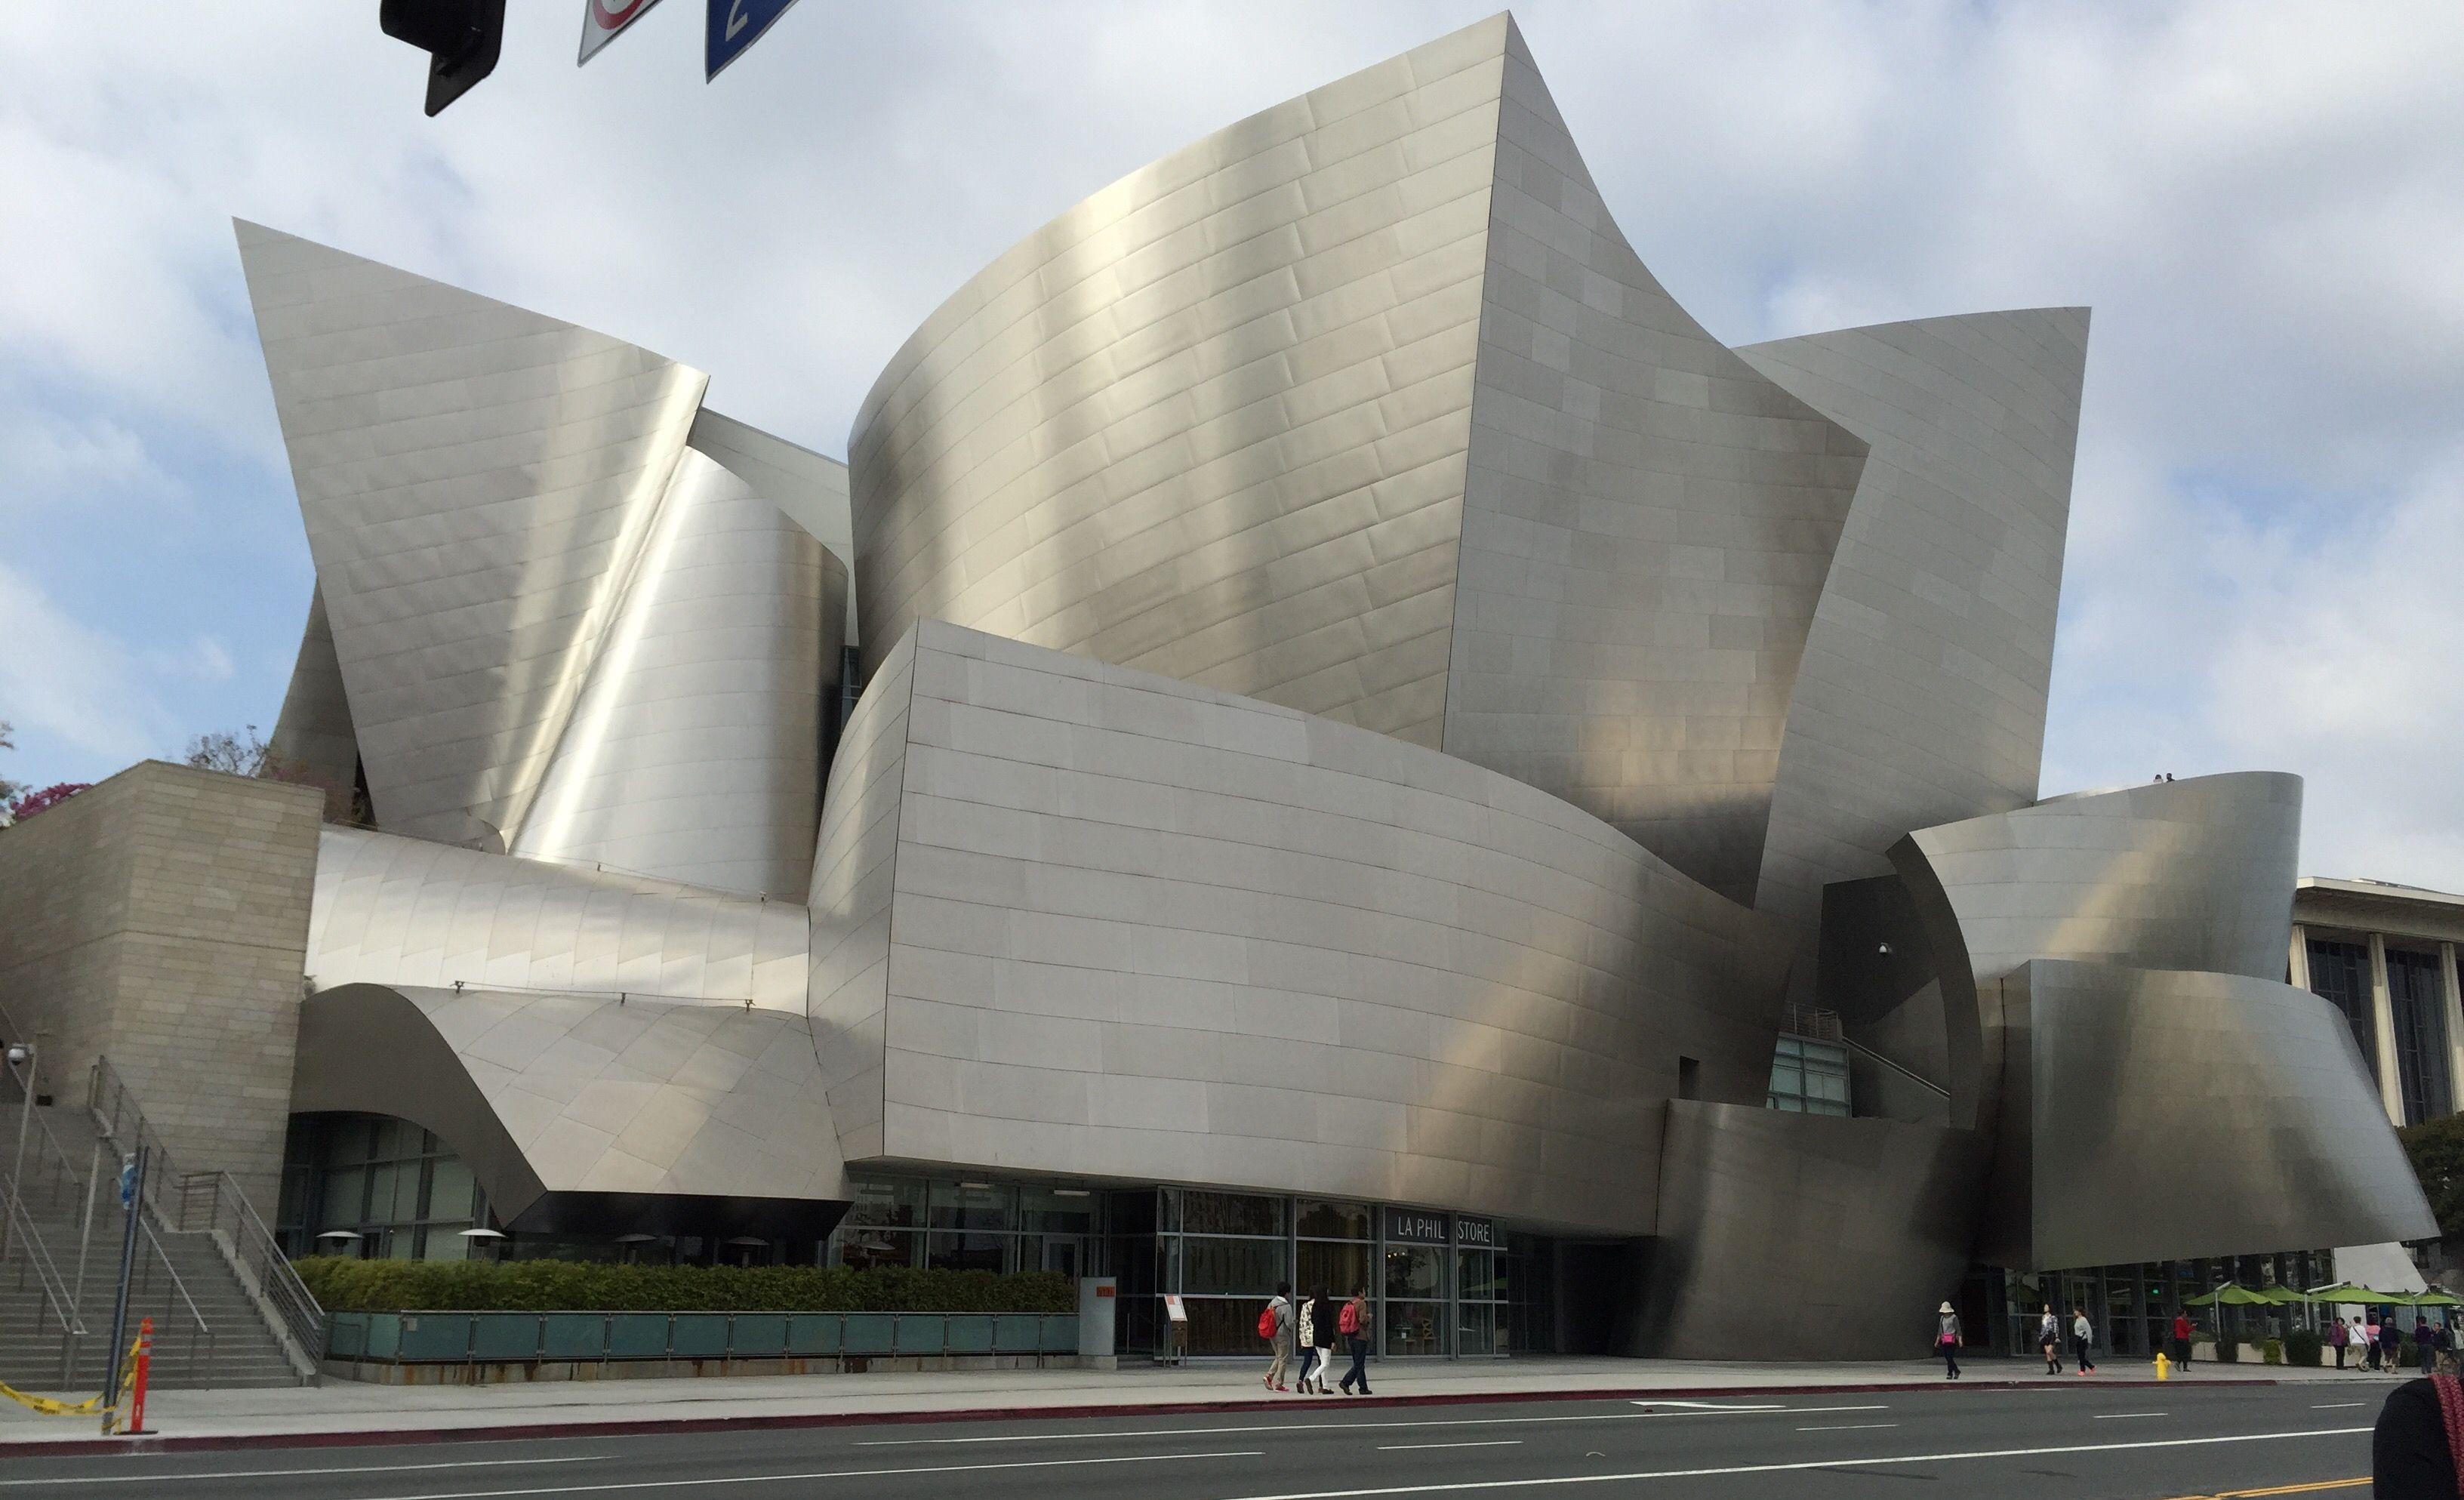 Walt Disney Concert Hall In Los Angeles Ca In 2020 Free Things To Do Free Things Things To Do